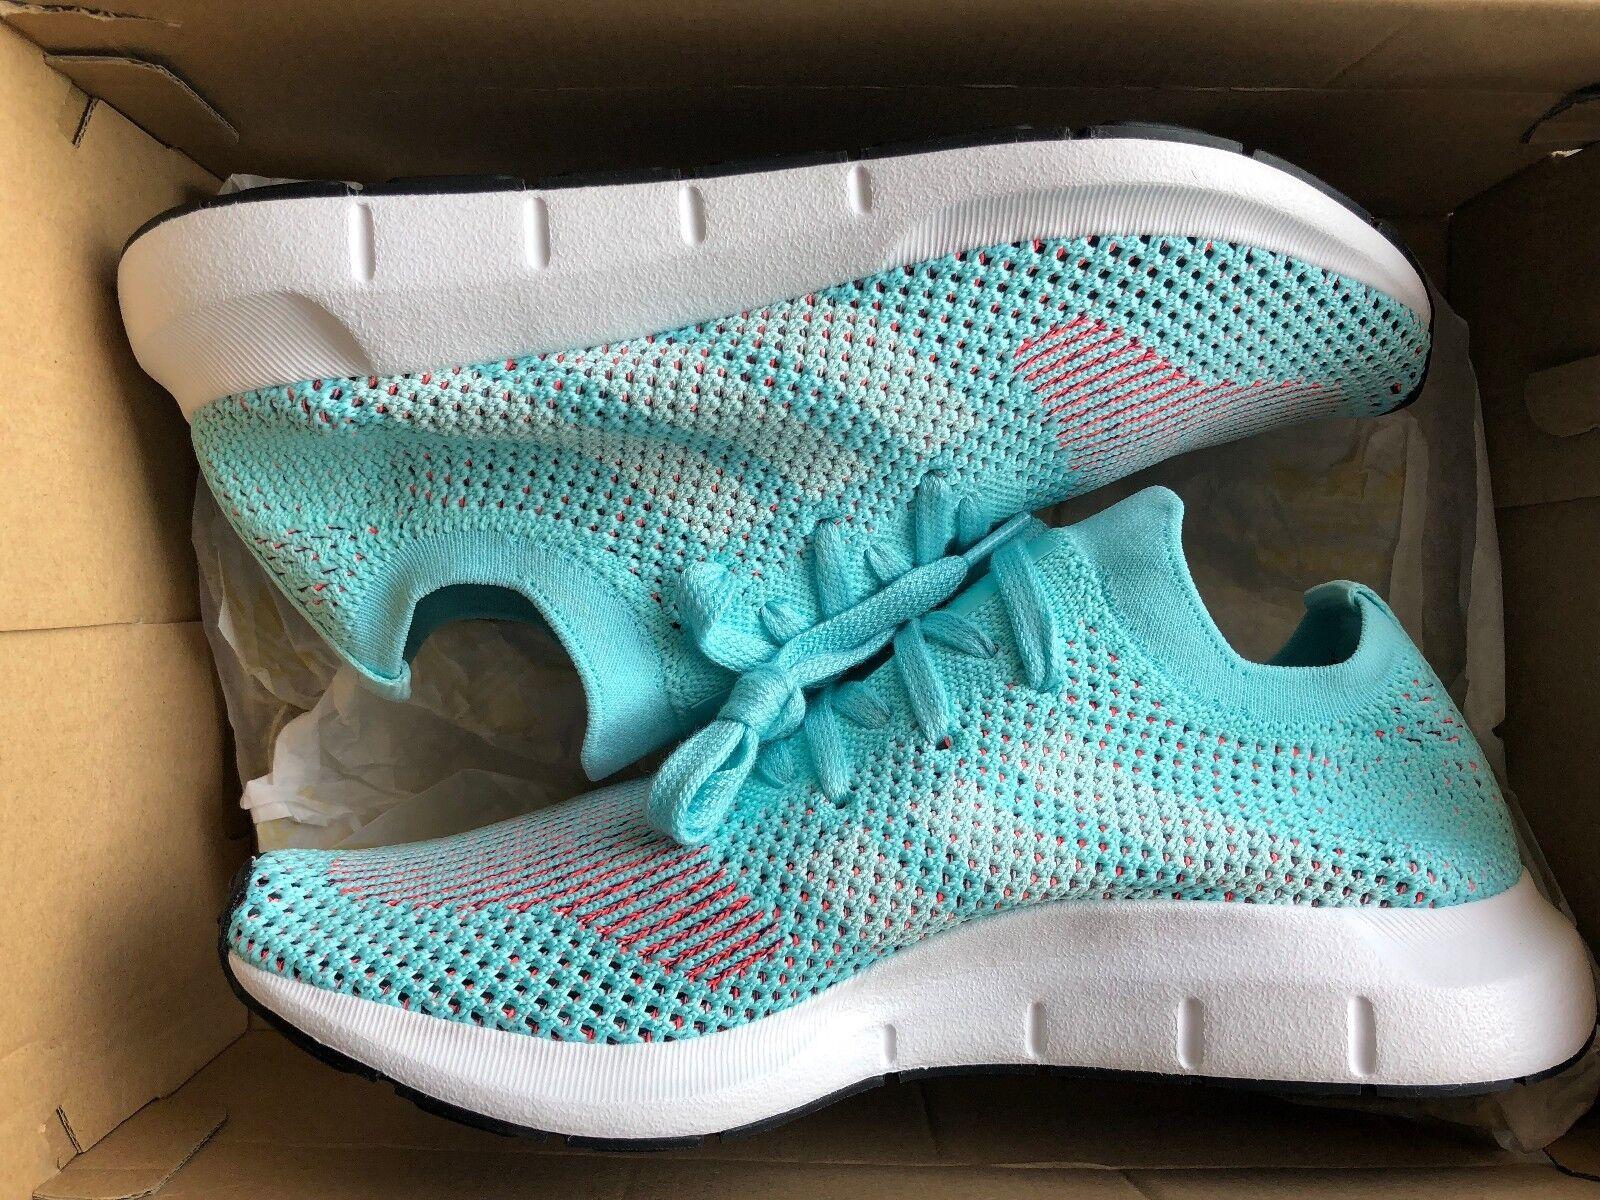 CQ2034 Adidas Originals Swift Run Pk Primeknit W Women Aqua White Running shoes